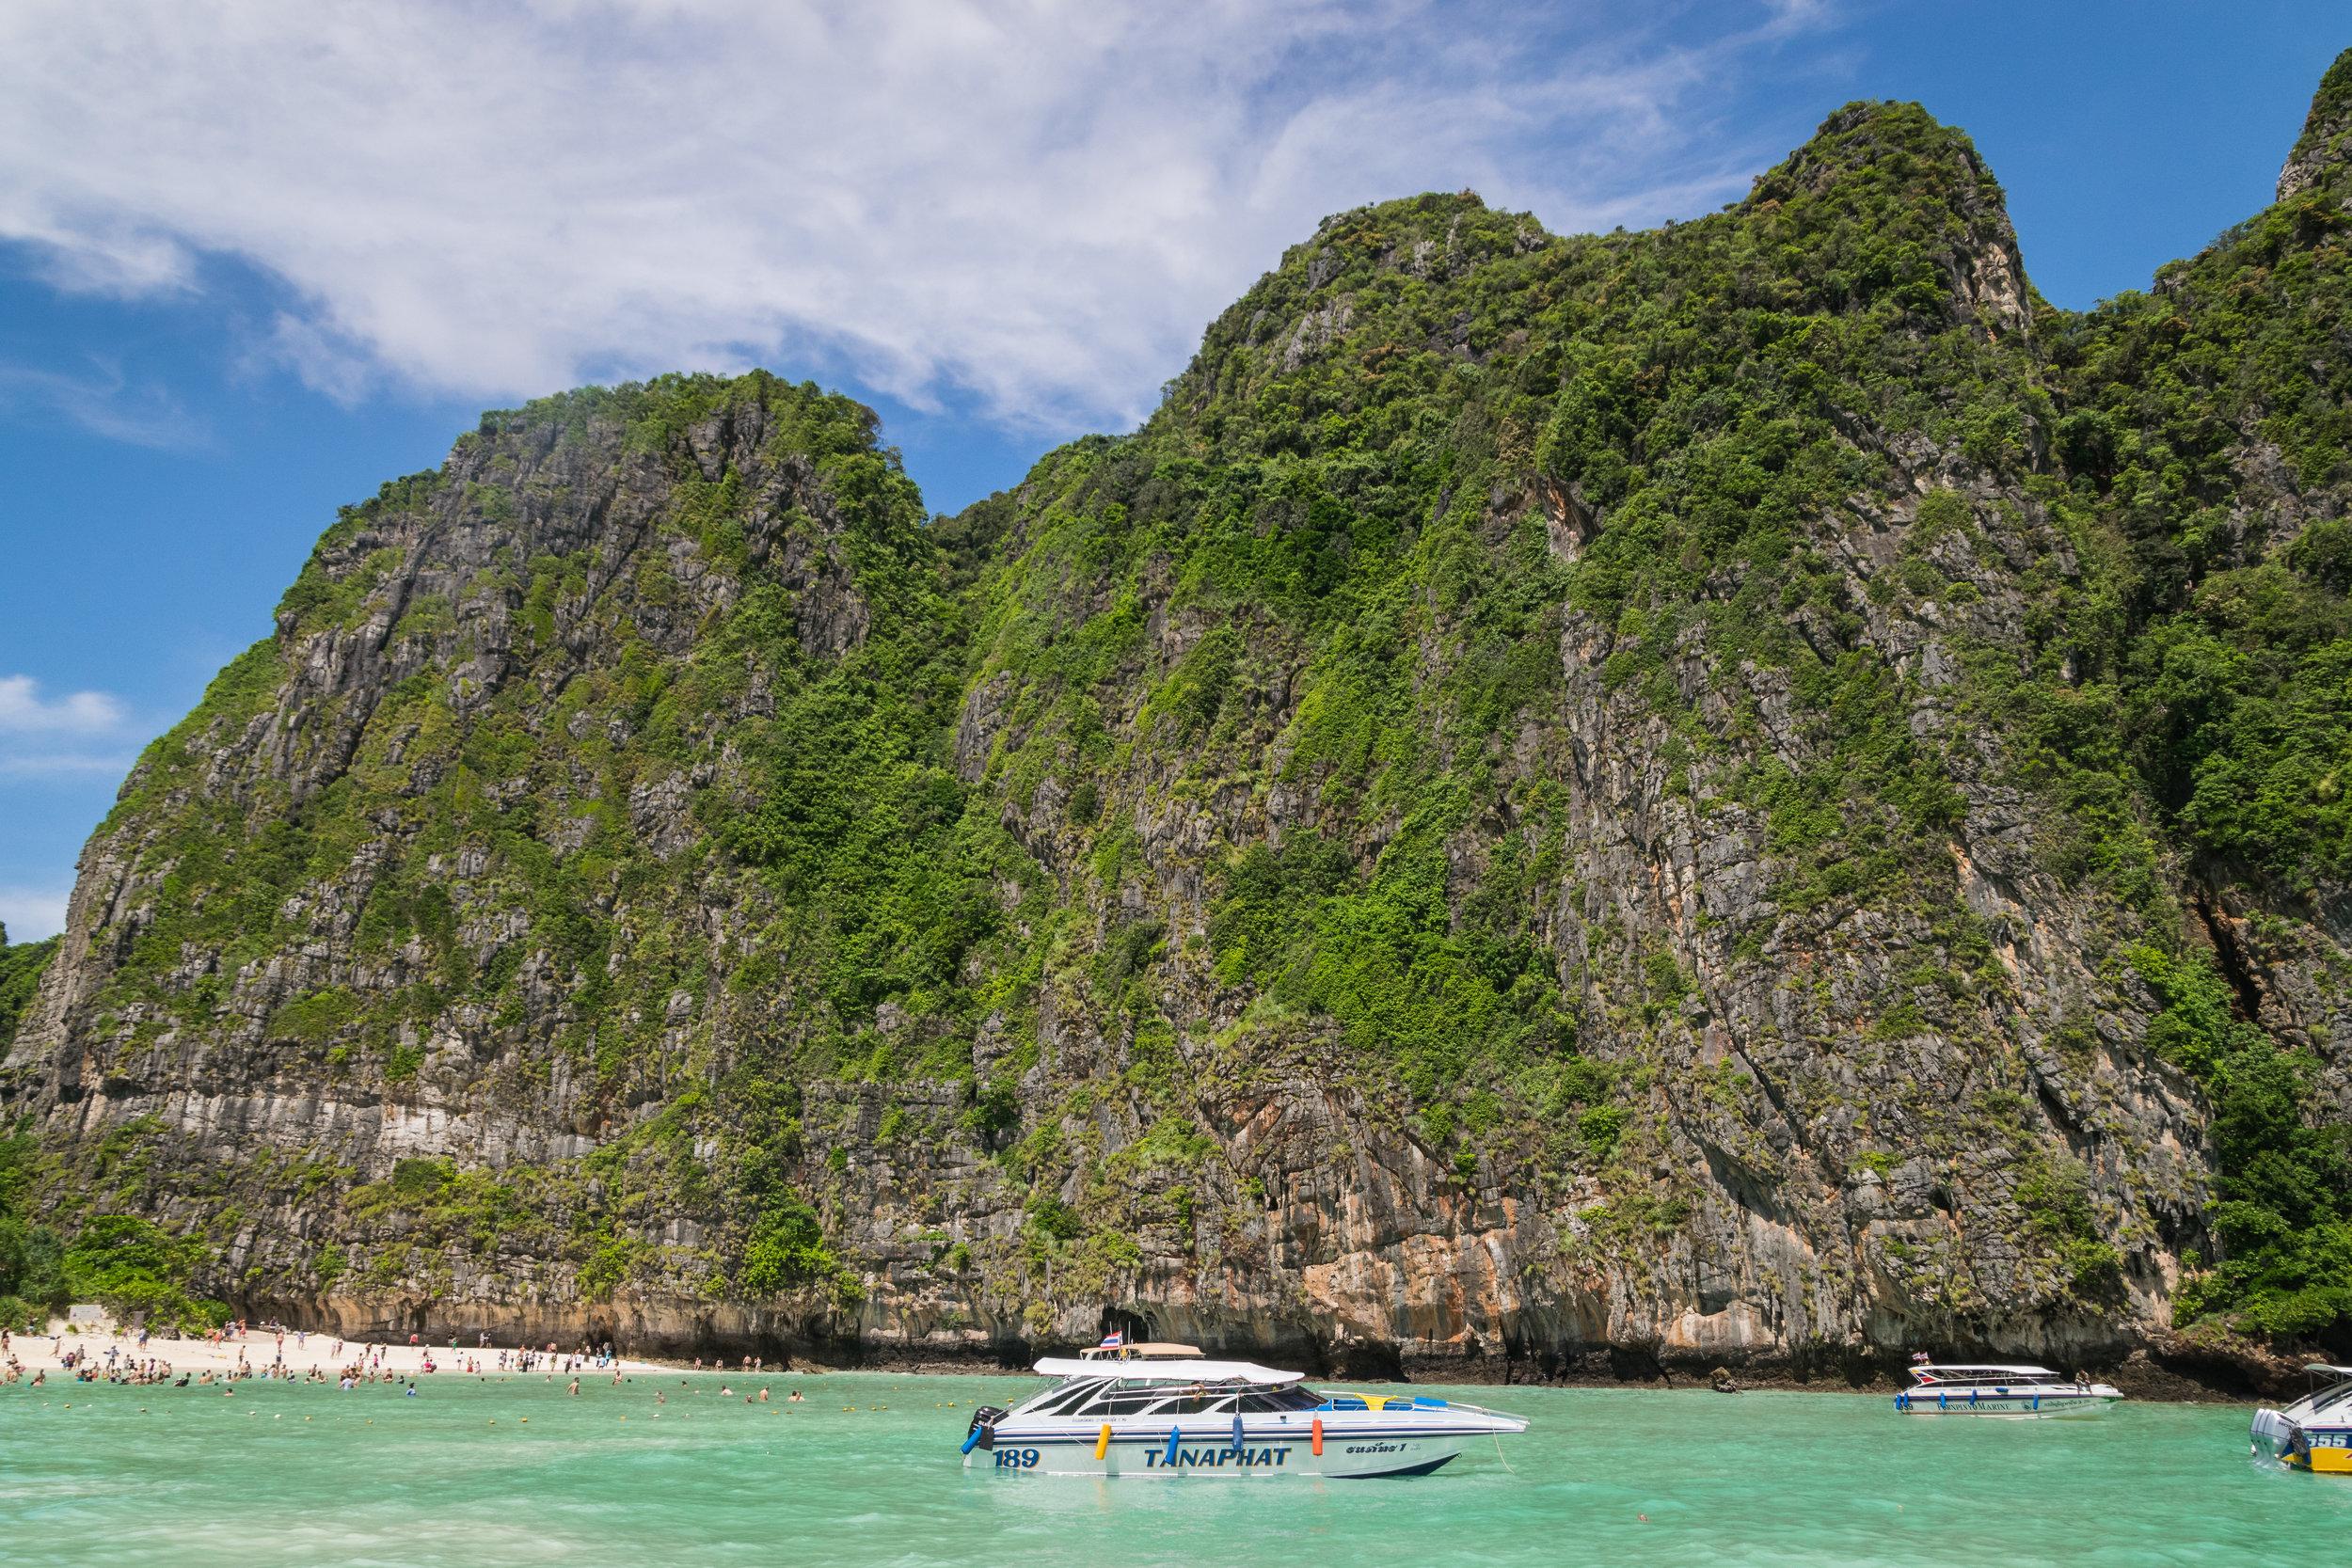 speedboats & tourists everywhere